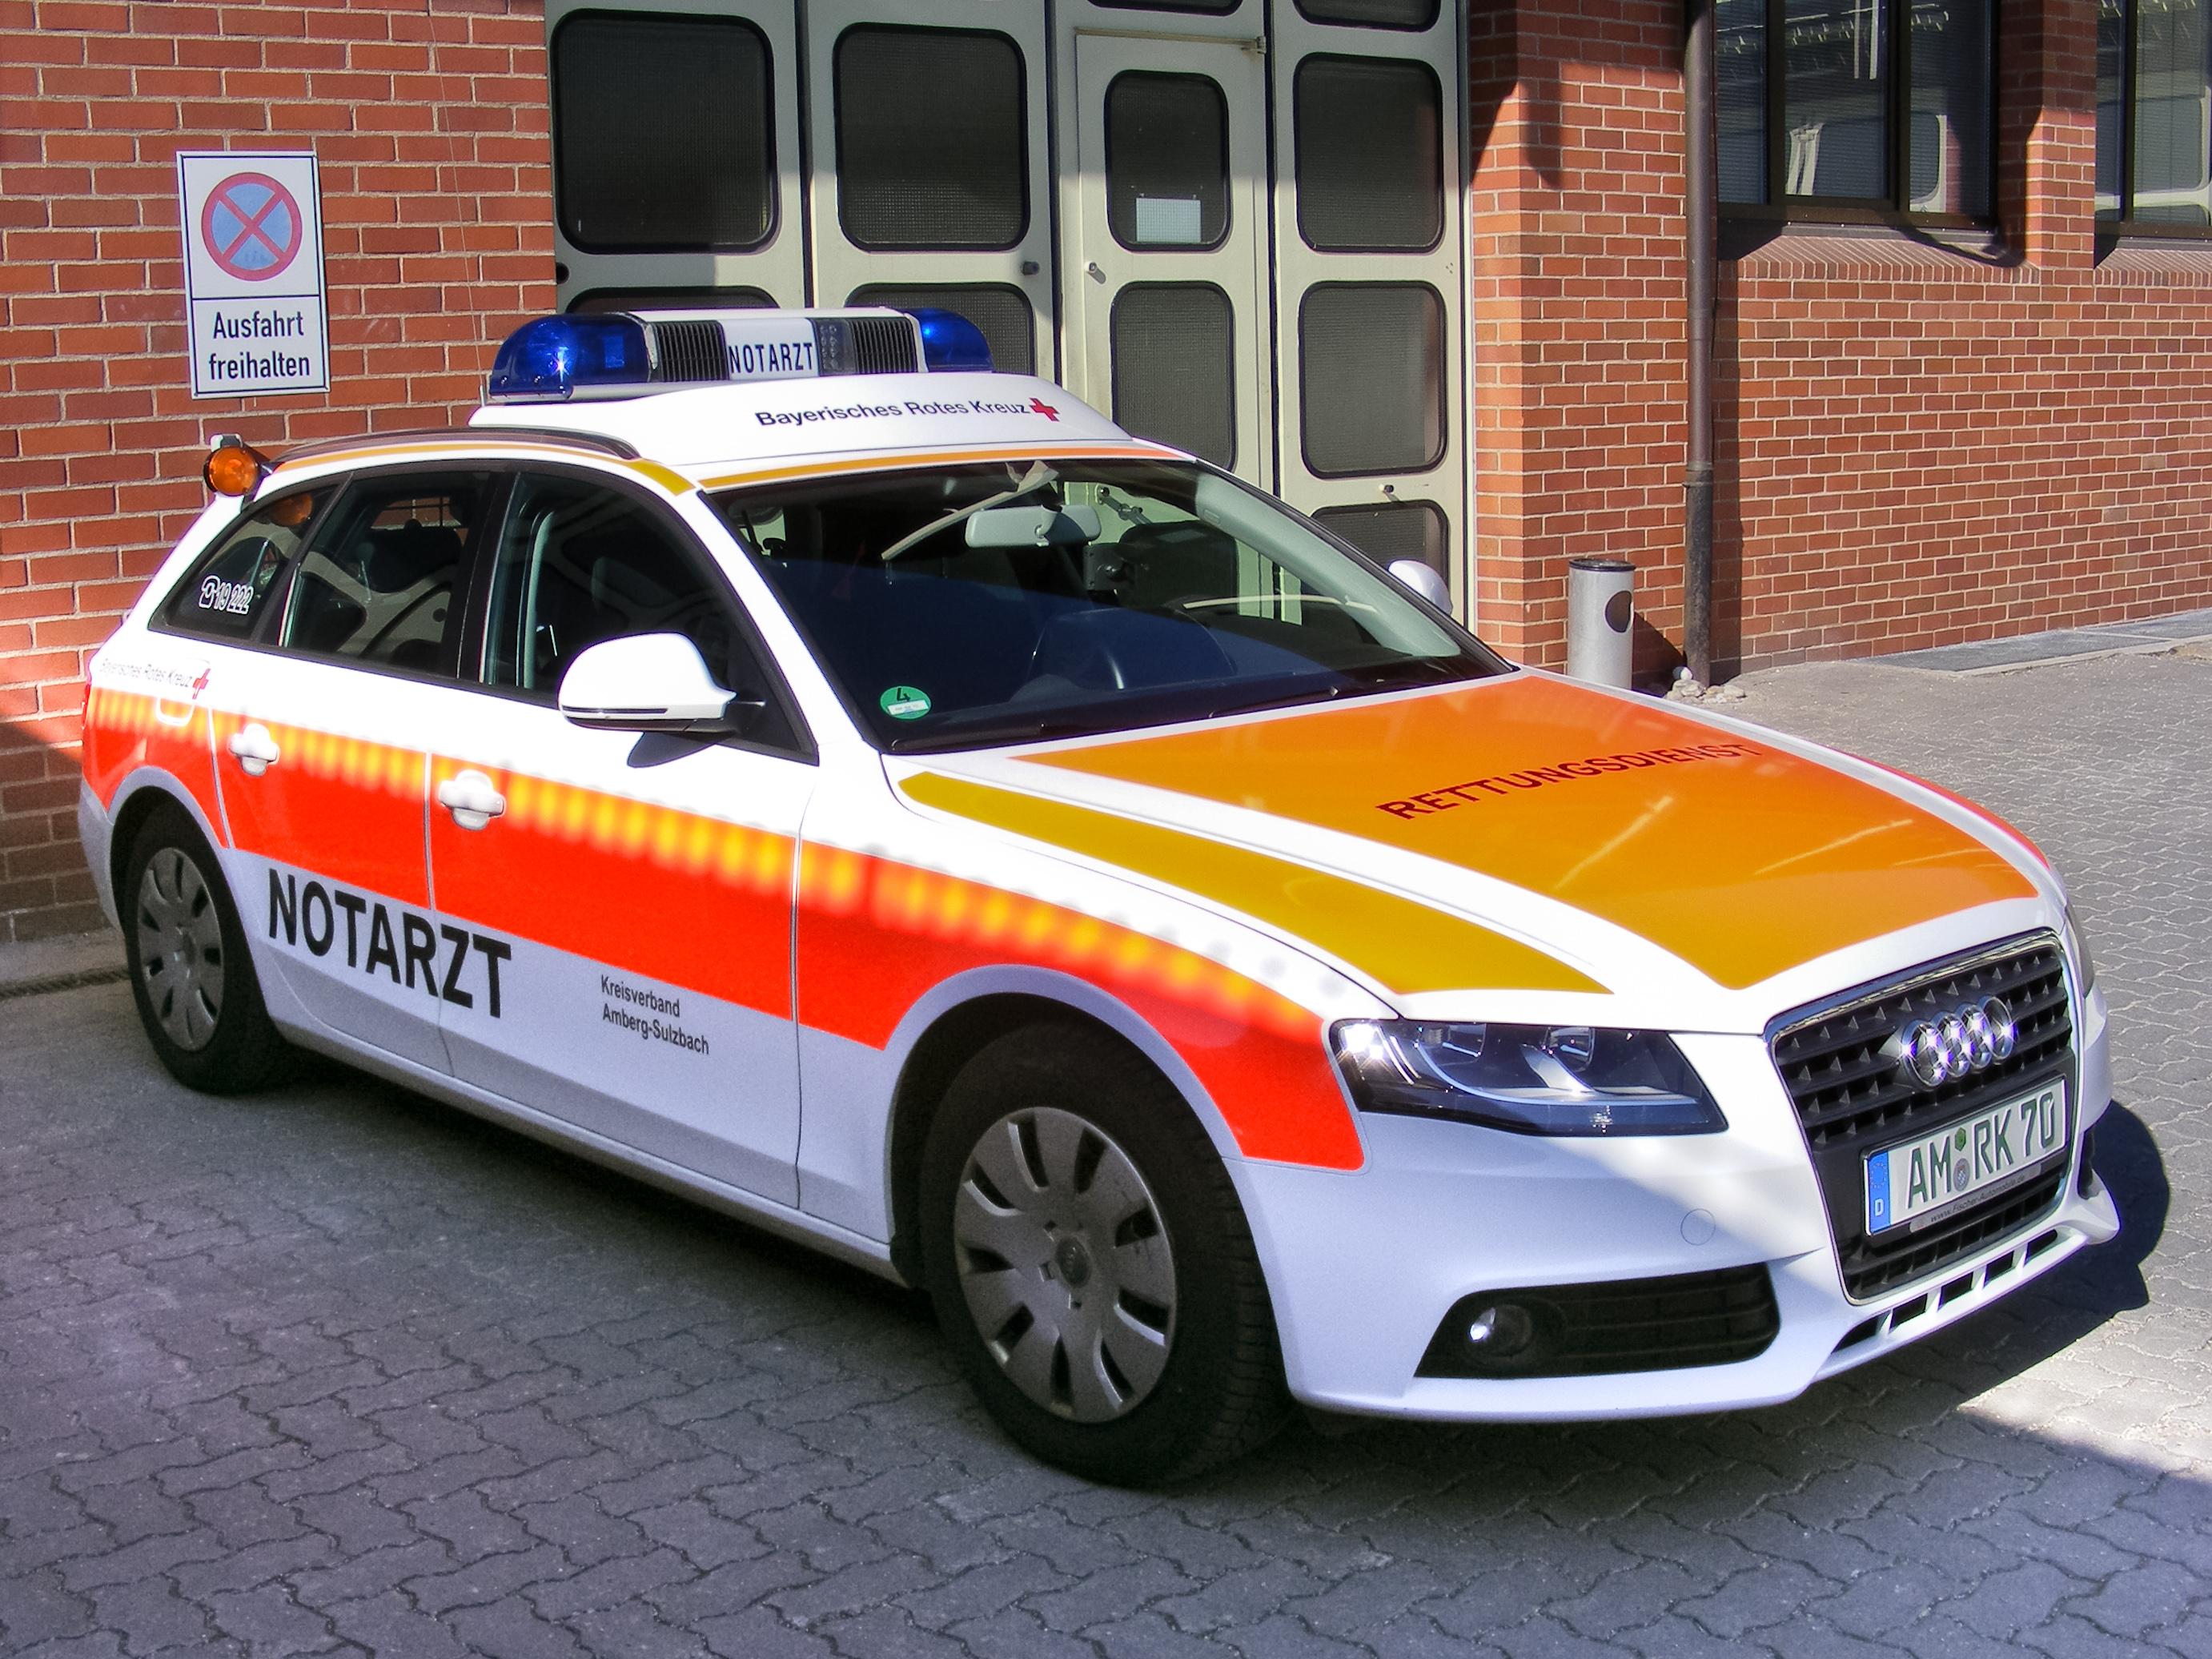 File:Amberg - Notarzt-PKW (Audi Avant, AM-RK70.jpg - Wikimedia Commons